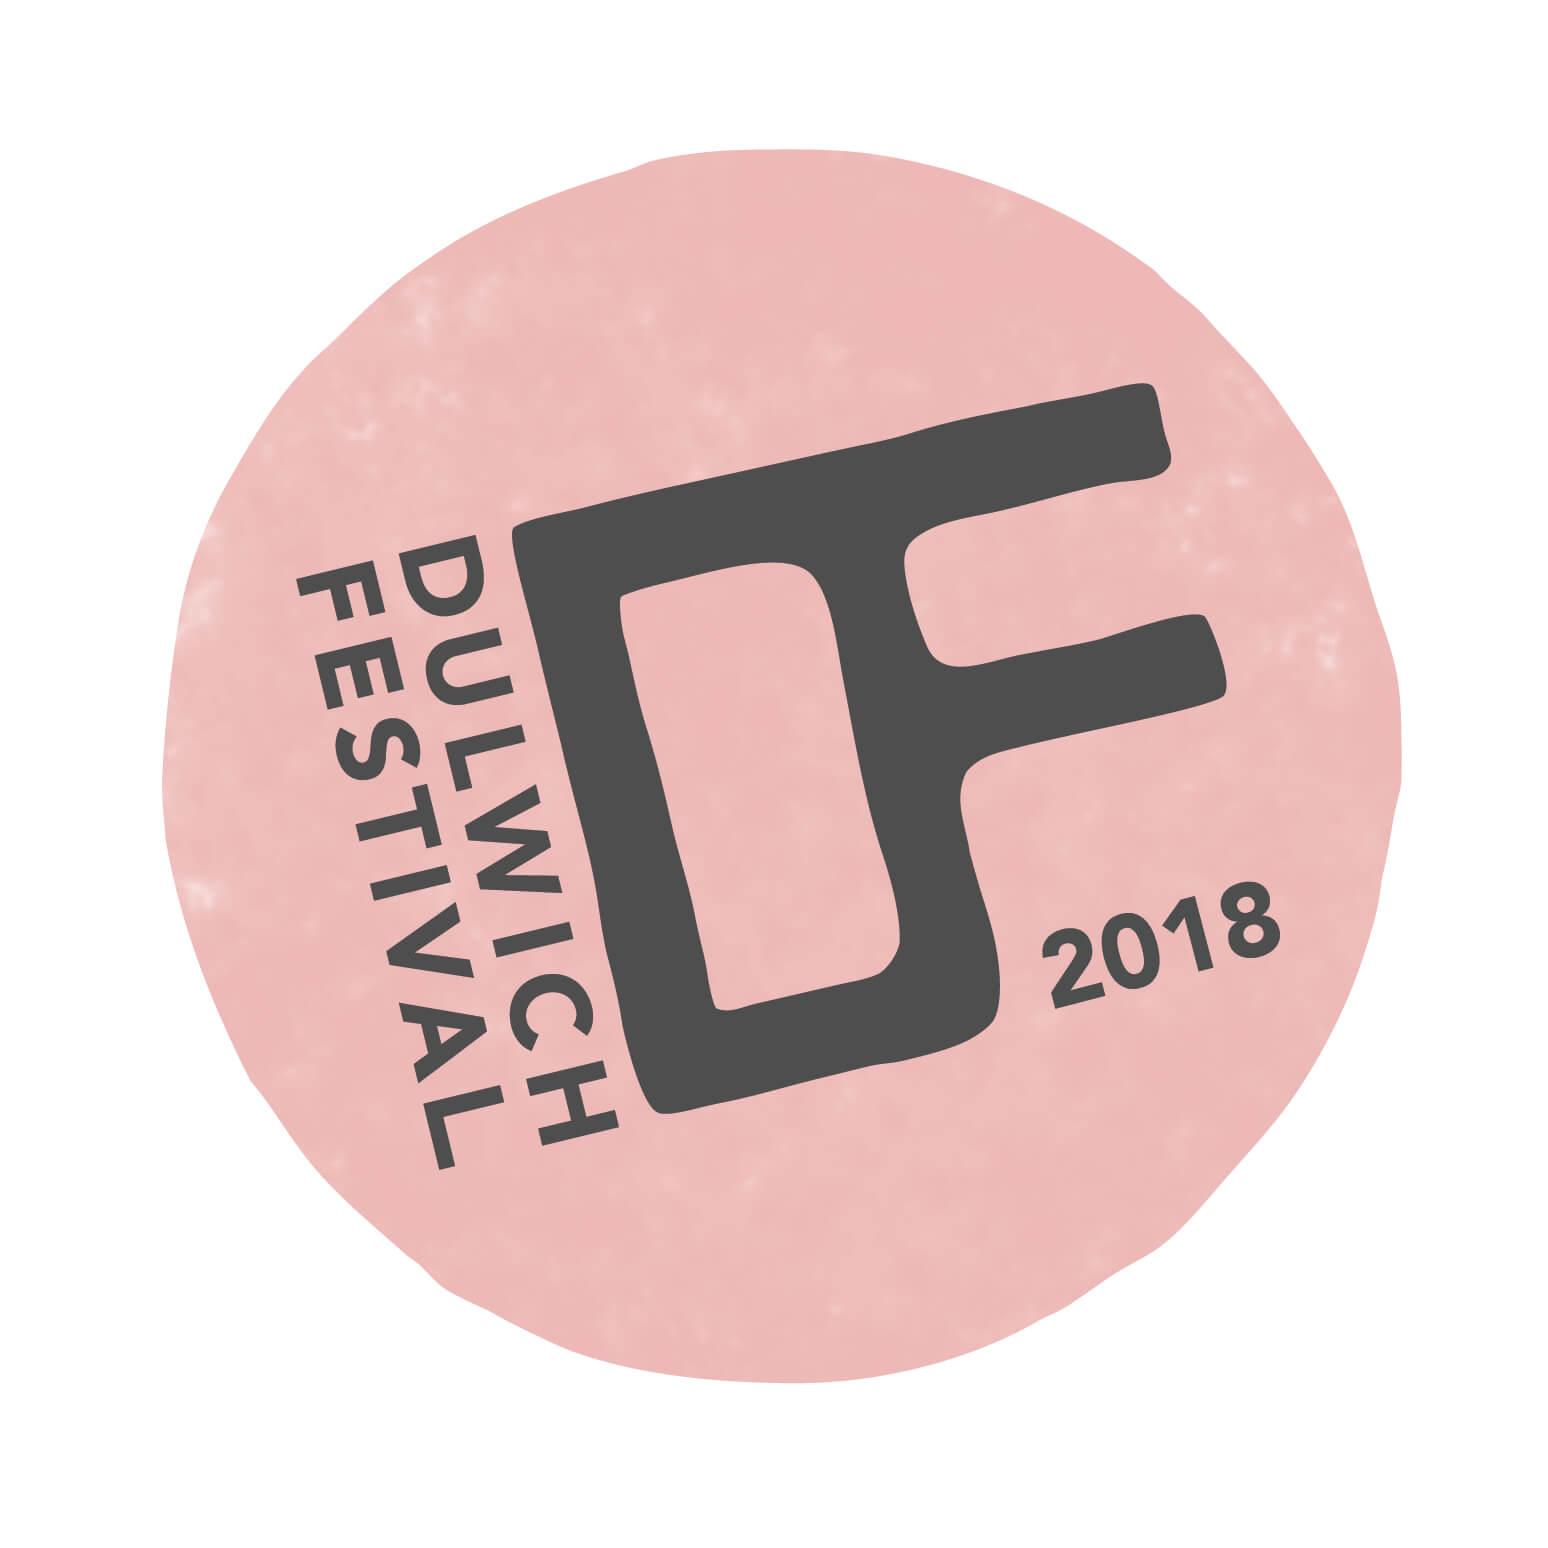 Dulwich Festival